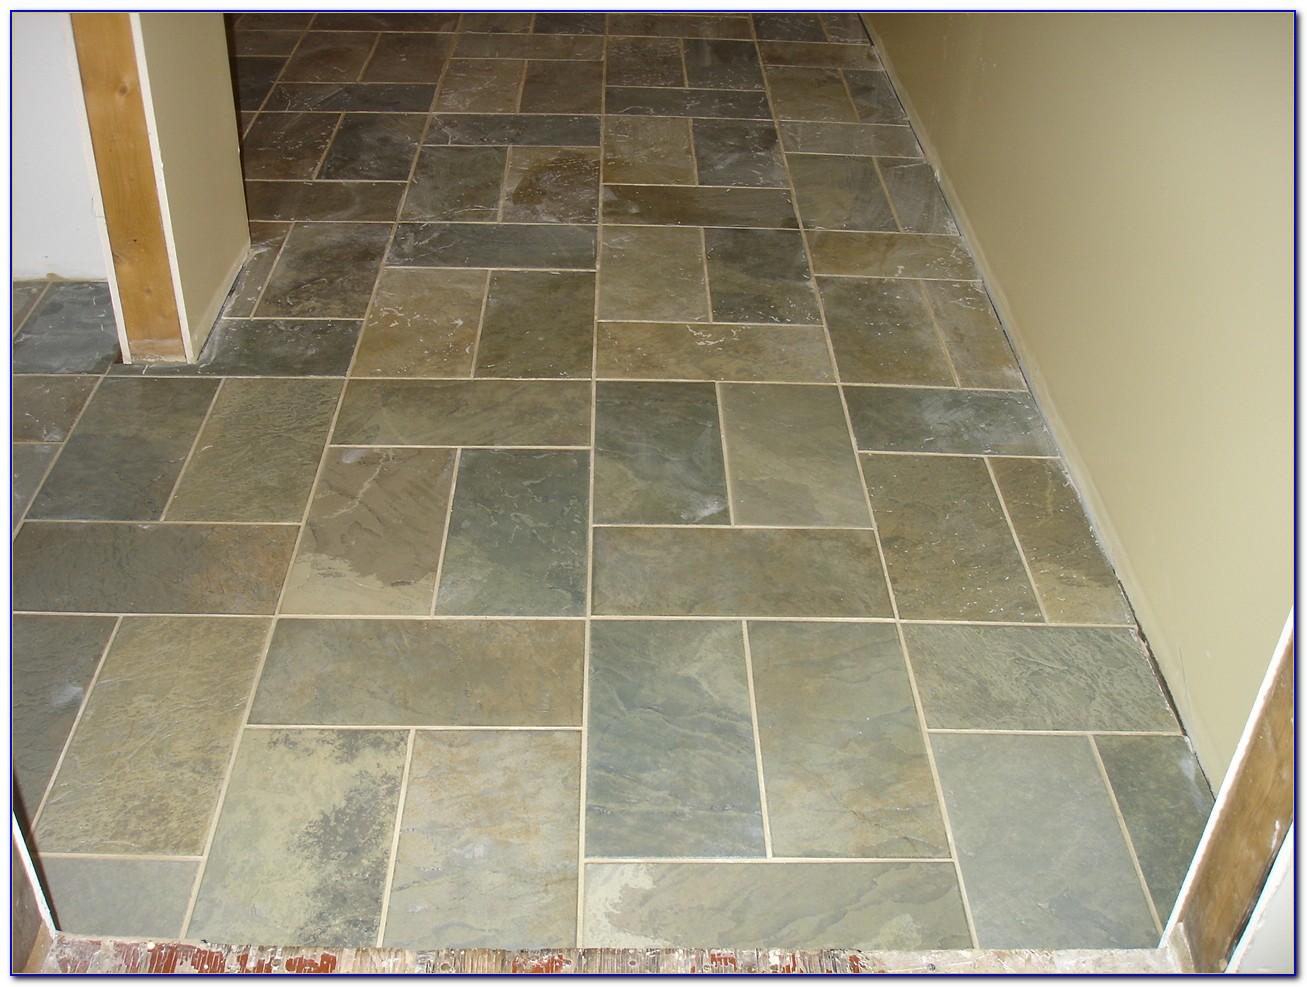 Painting Ceramic Tile To Look Like Slate